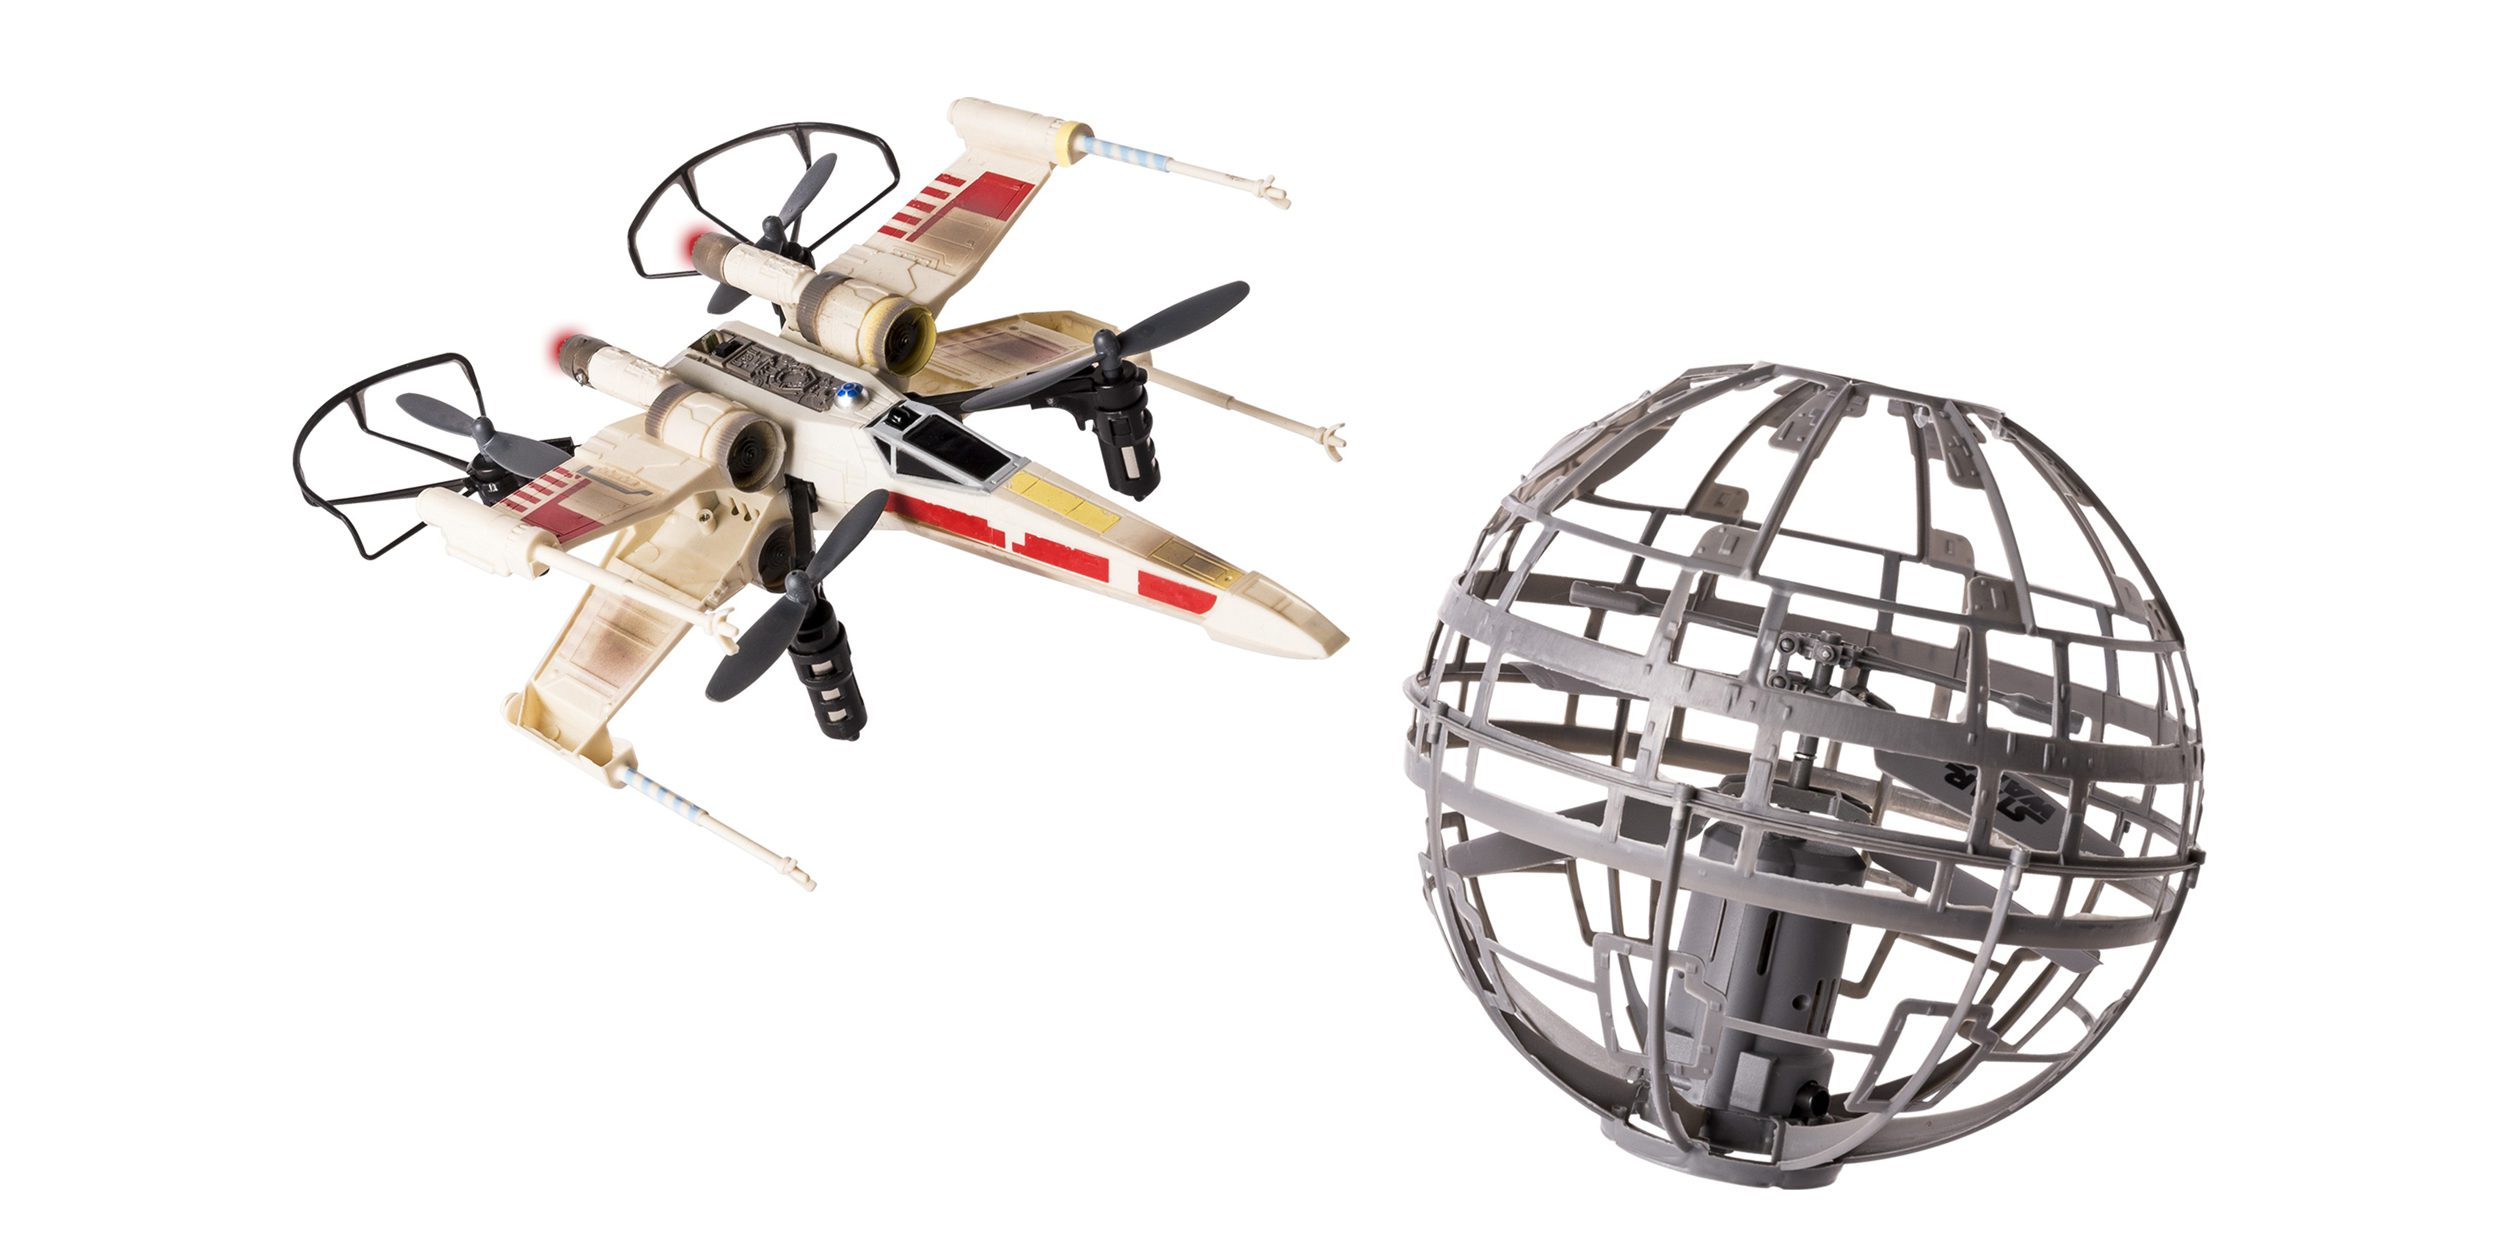 spin-master-star-wars-drones